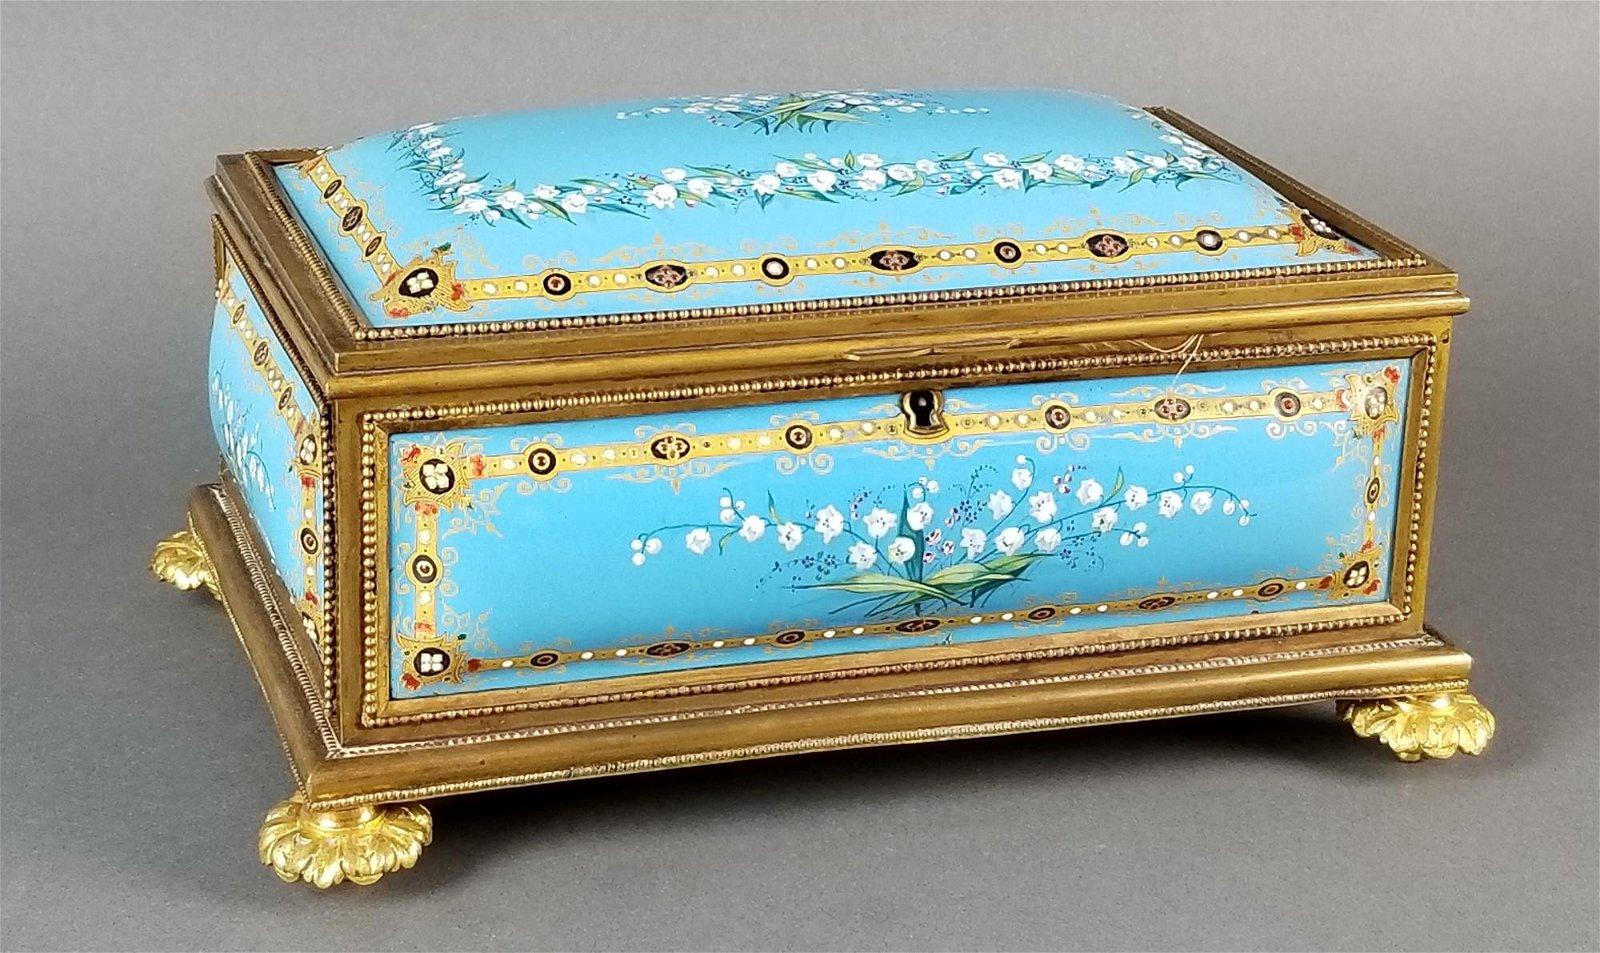 French Enamel and Bronze Handpainted Jewelry Box